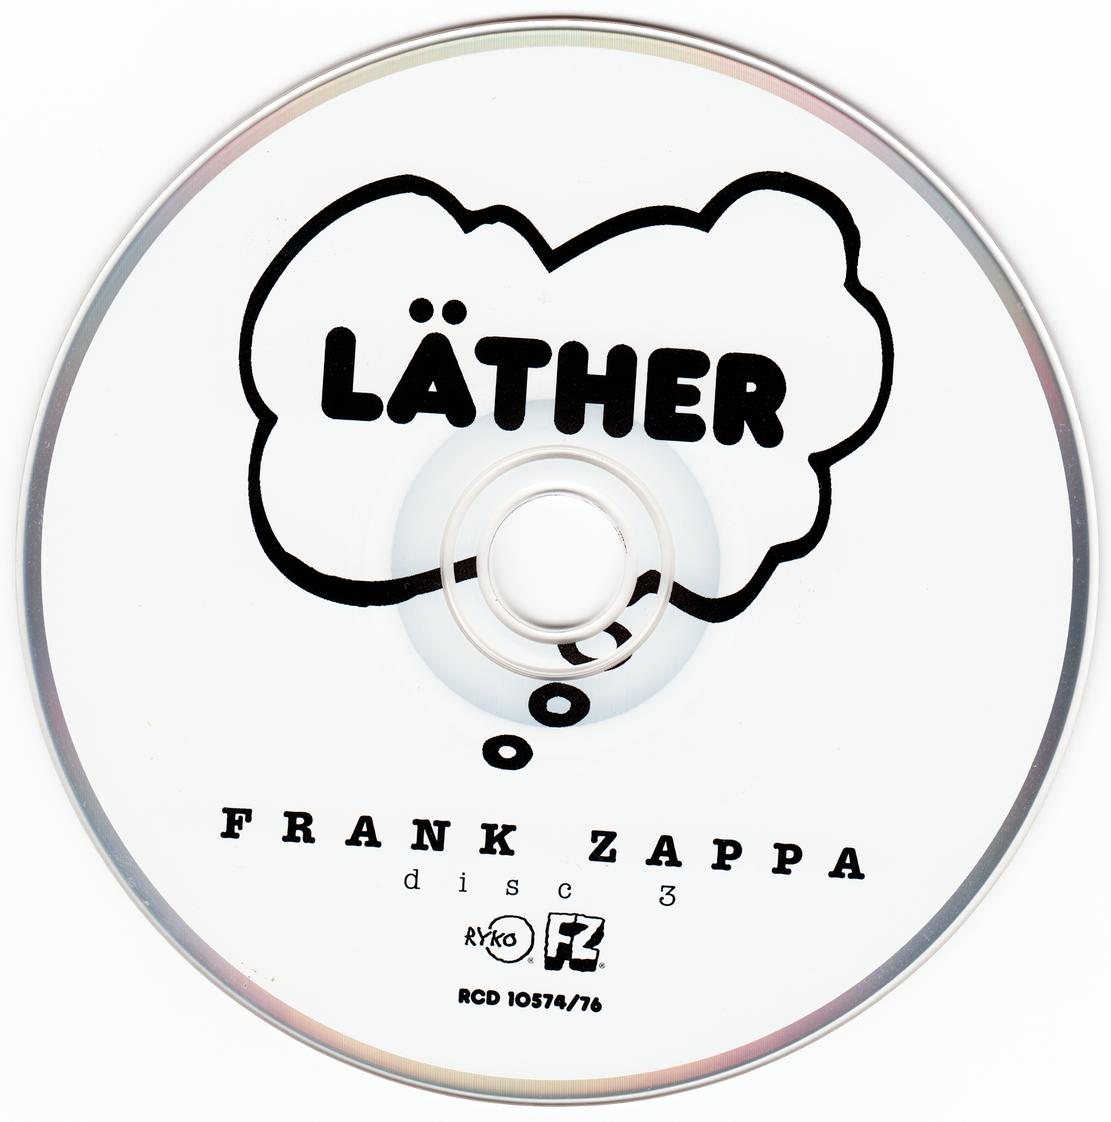 Frank Zappa Lather 1996 3cd Set Rykodisc Rcd10574 76